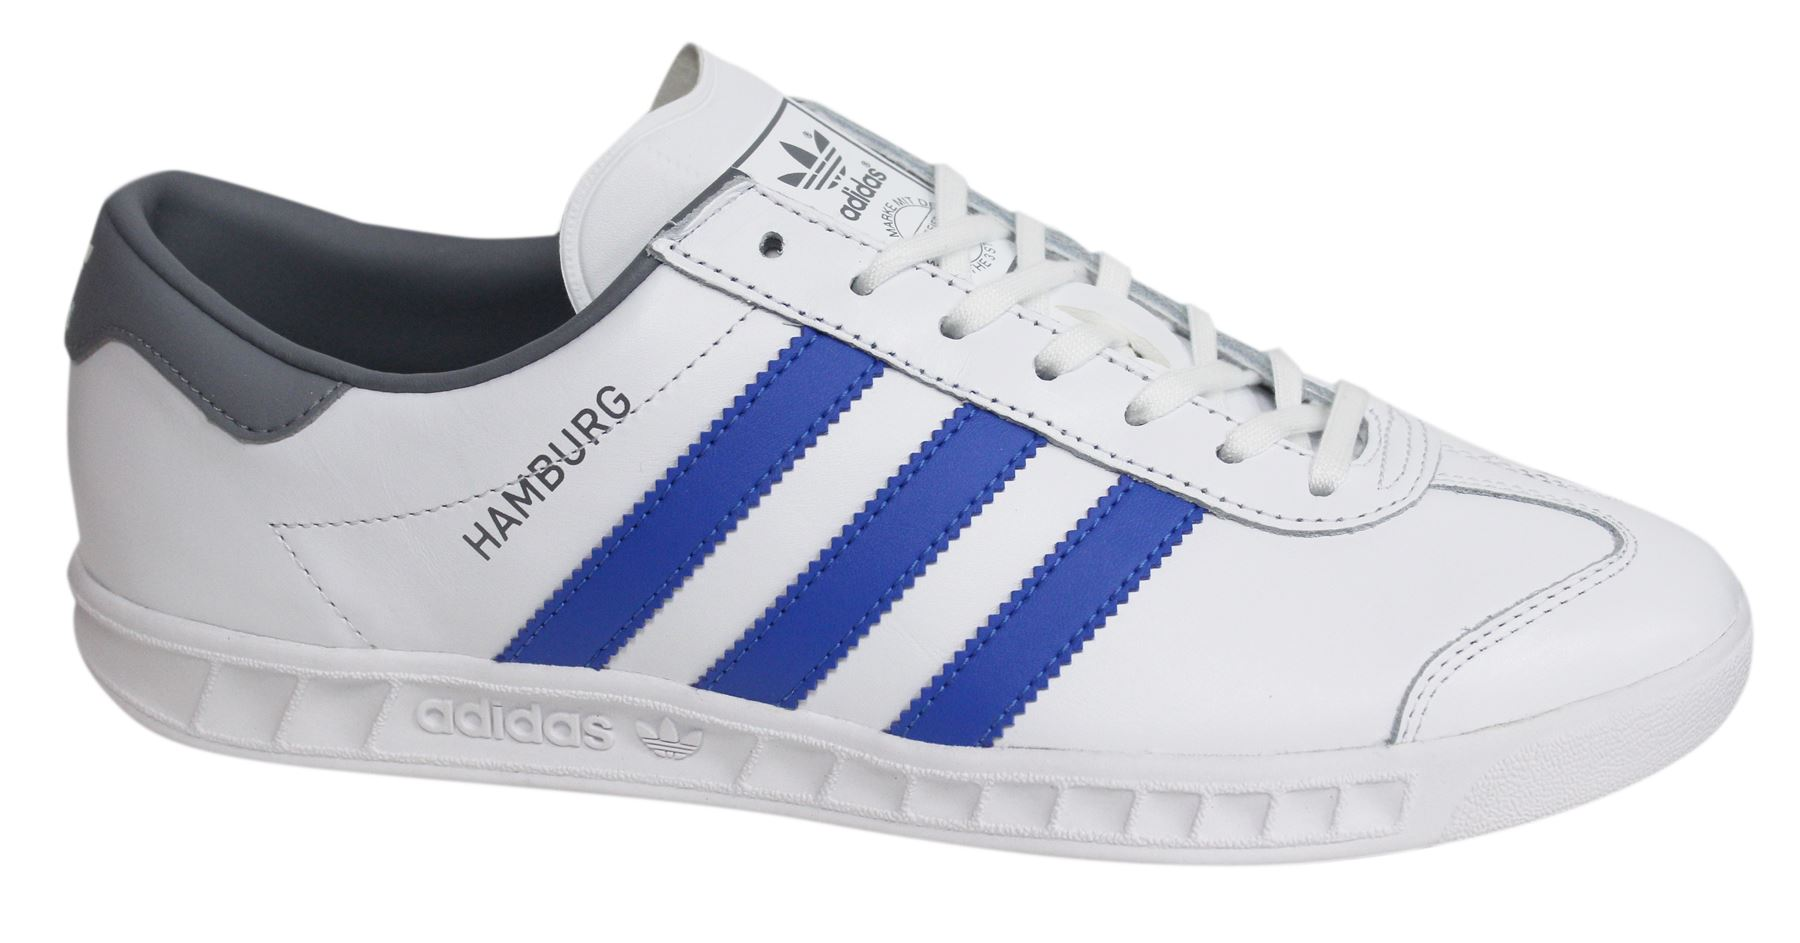 Mens ADIDAS HAMBURG White Leather Trainers BB2779  eBay